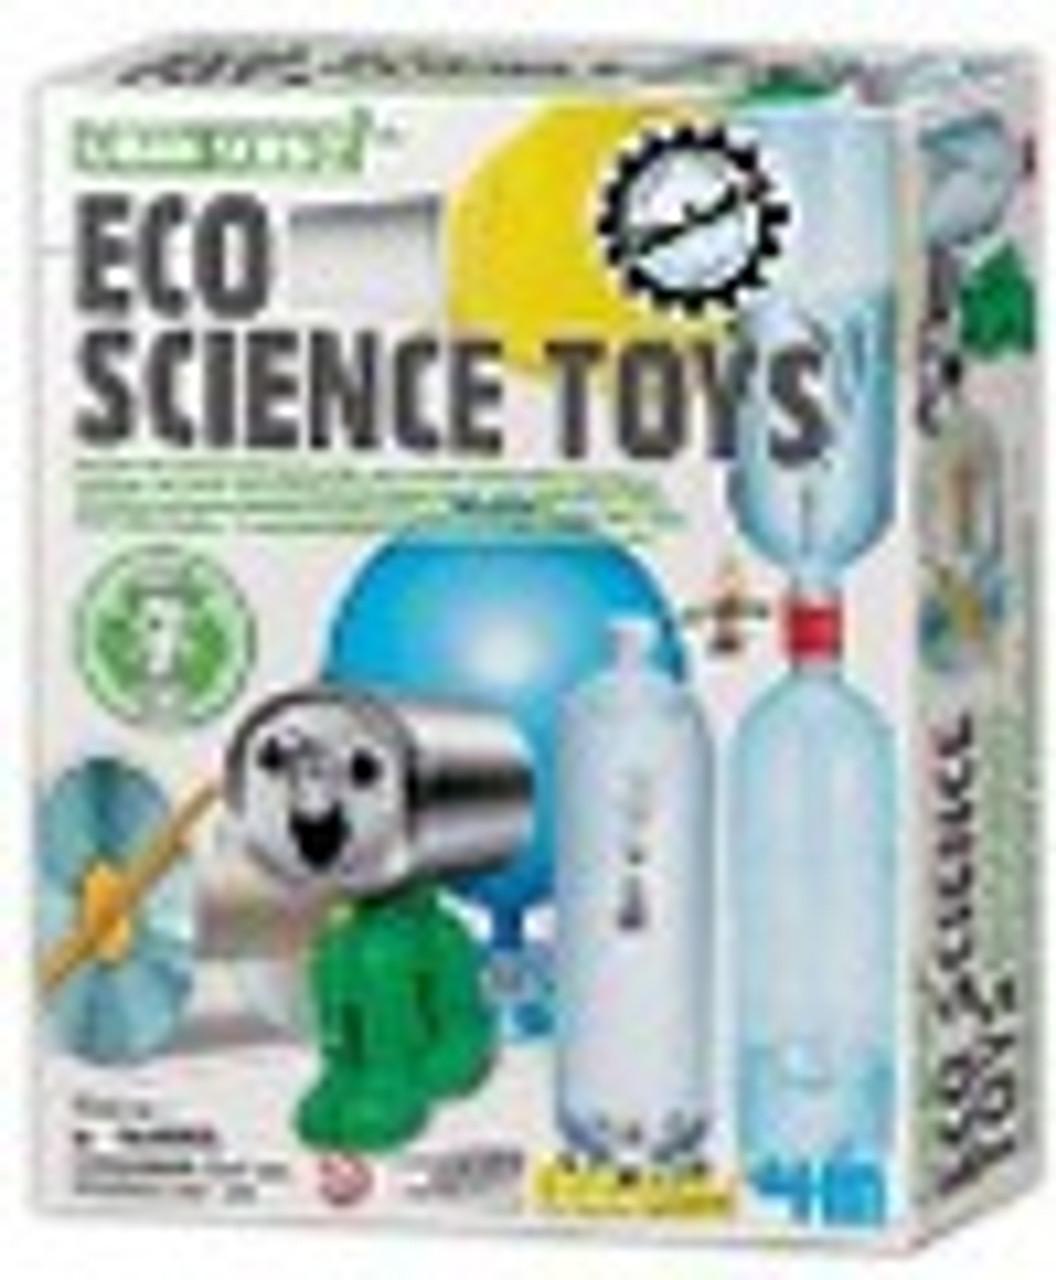 Green Science/Alternative Energy